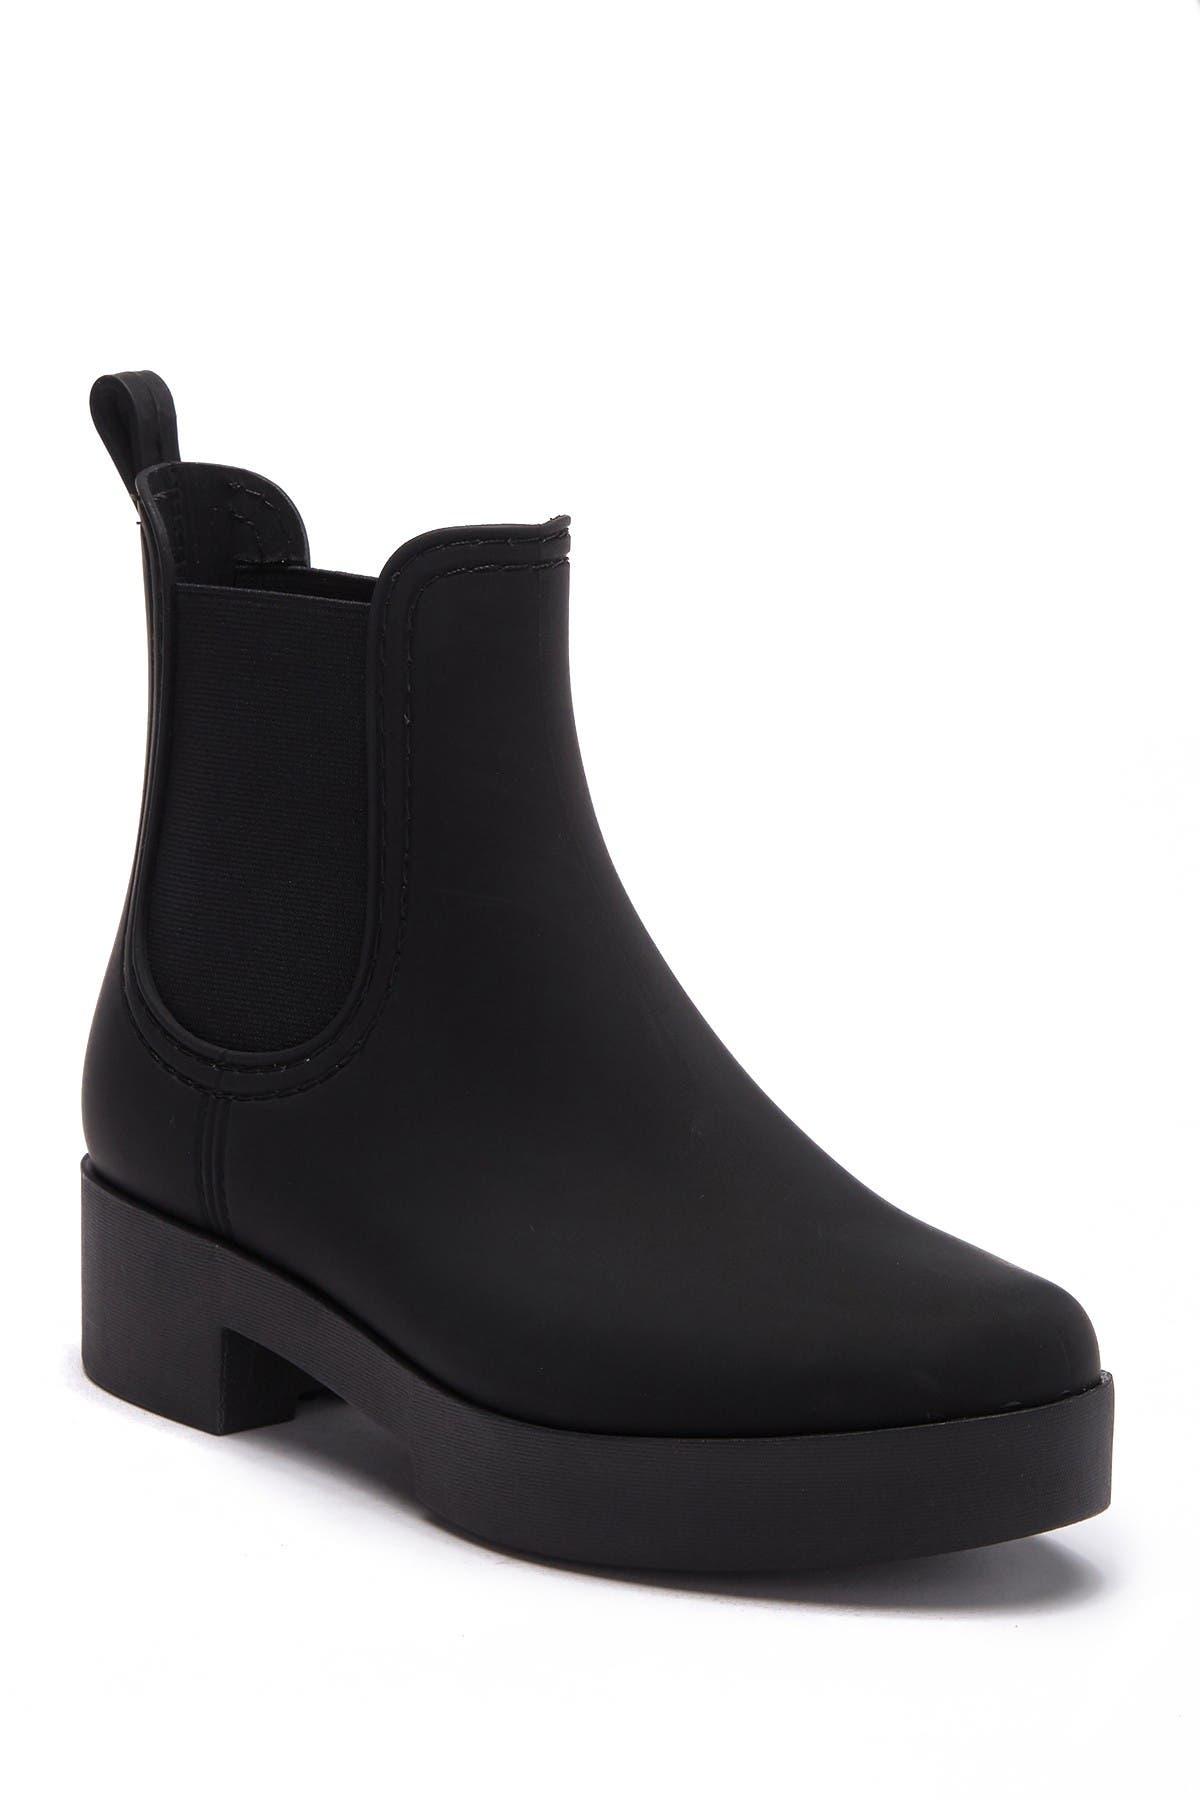 Image of Jeffrey Campbell Hydra Platform Waterproof Chelsea Boot